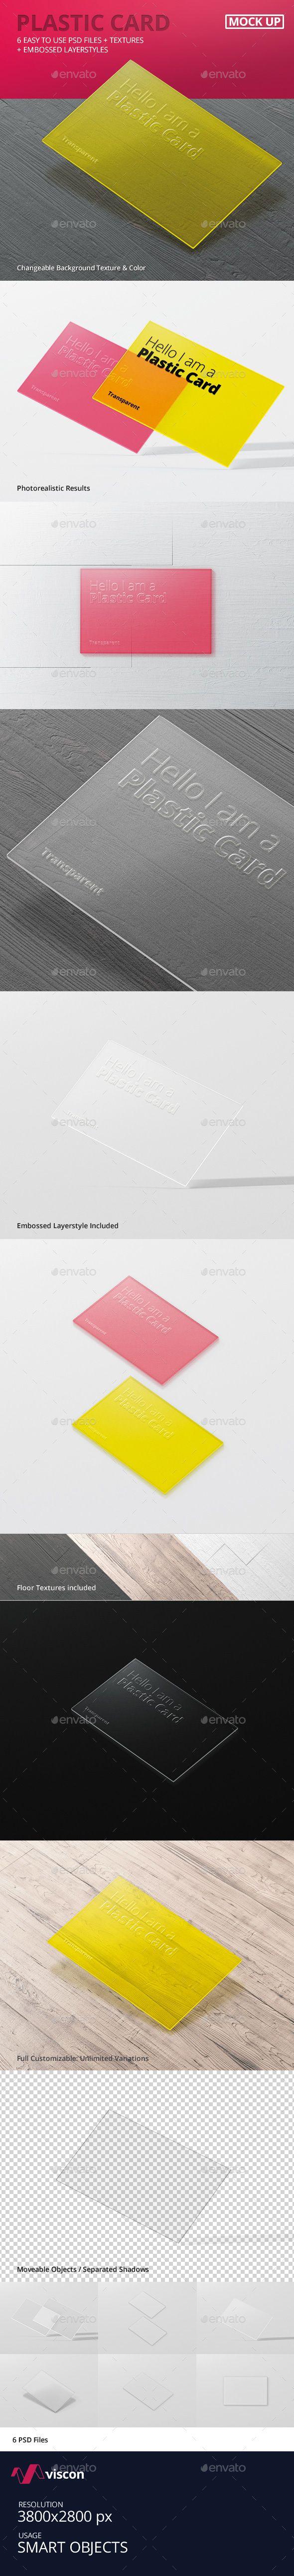 Transparent Business Card Mock Ups Mockup Business Cards And